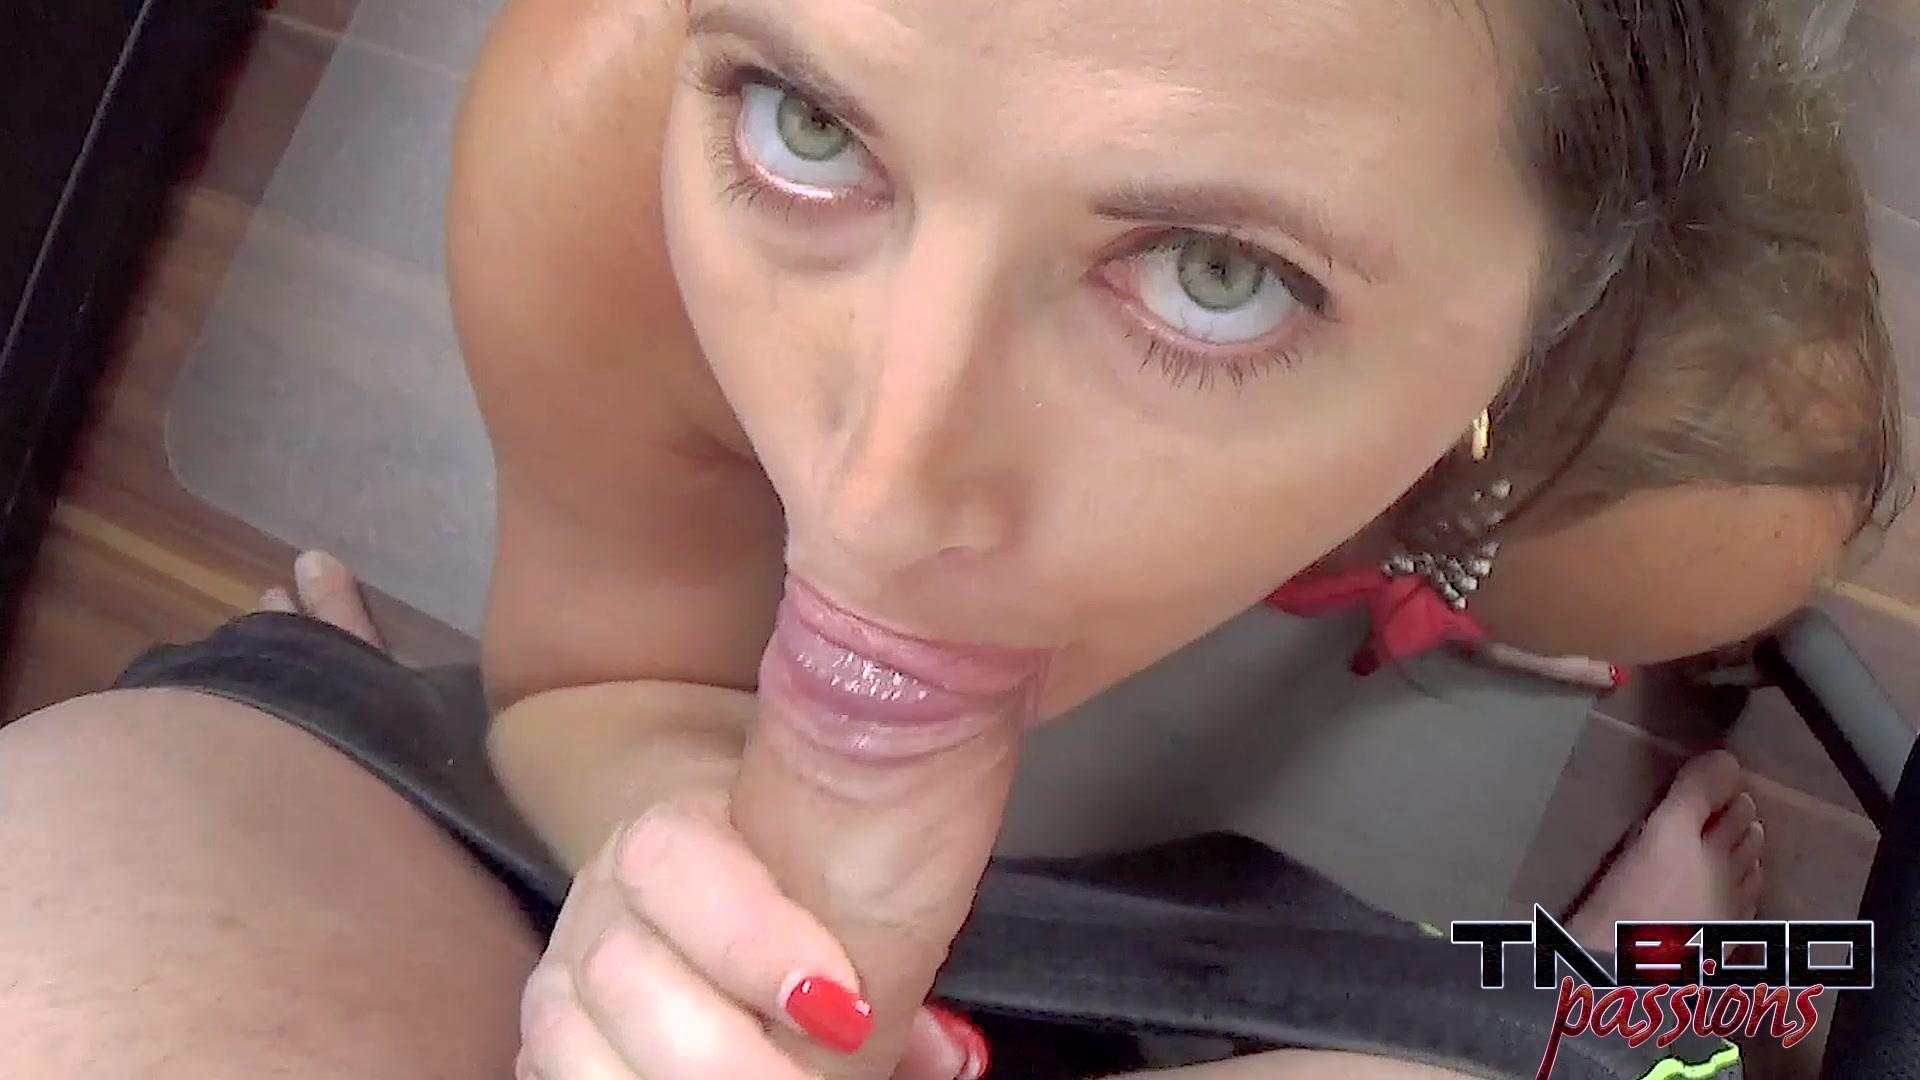 Making A Porno With My Stepmom Big butt big cock tube